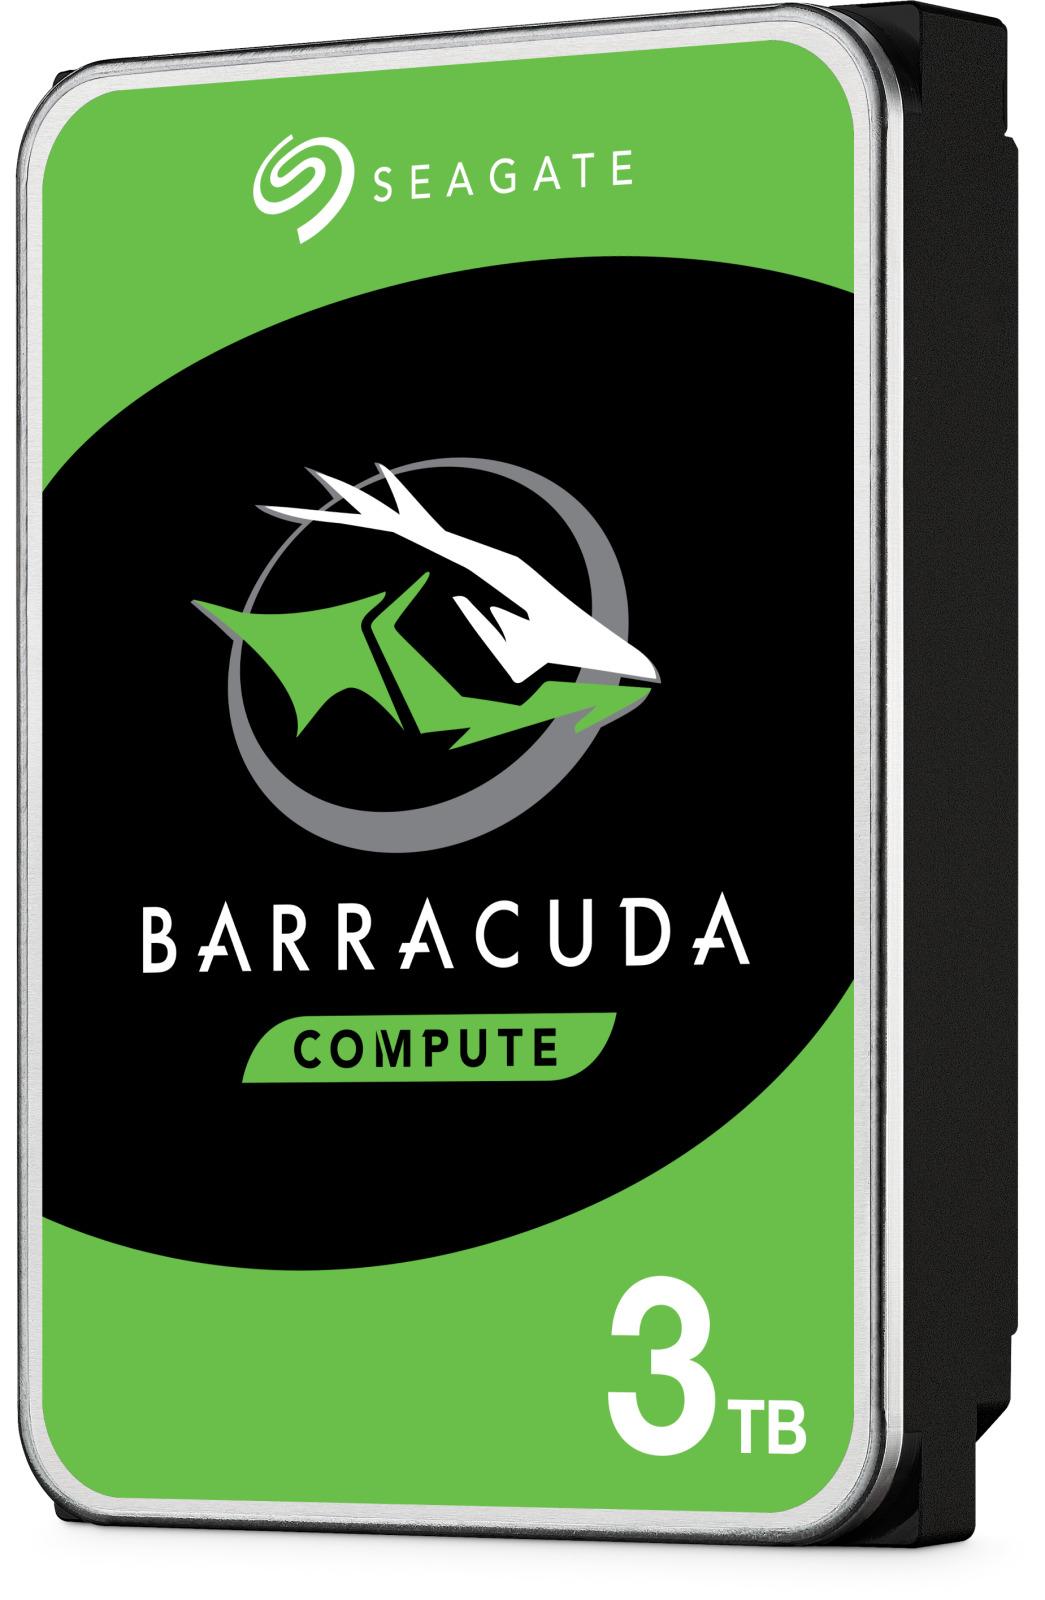 3TB Seagate BarraCuda HDD image